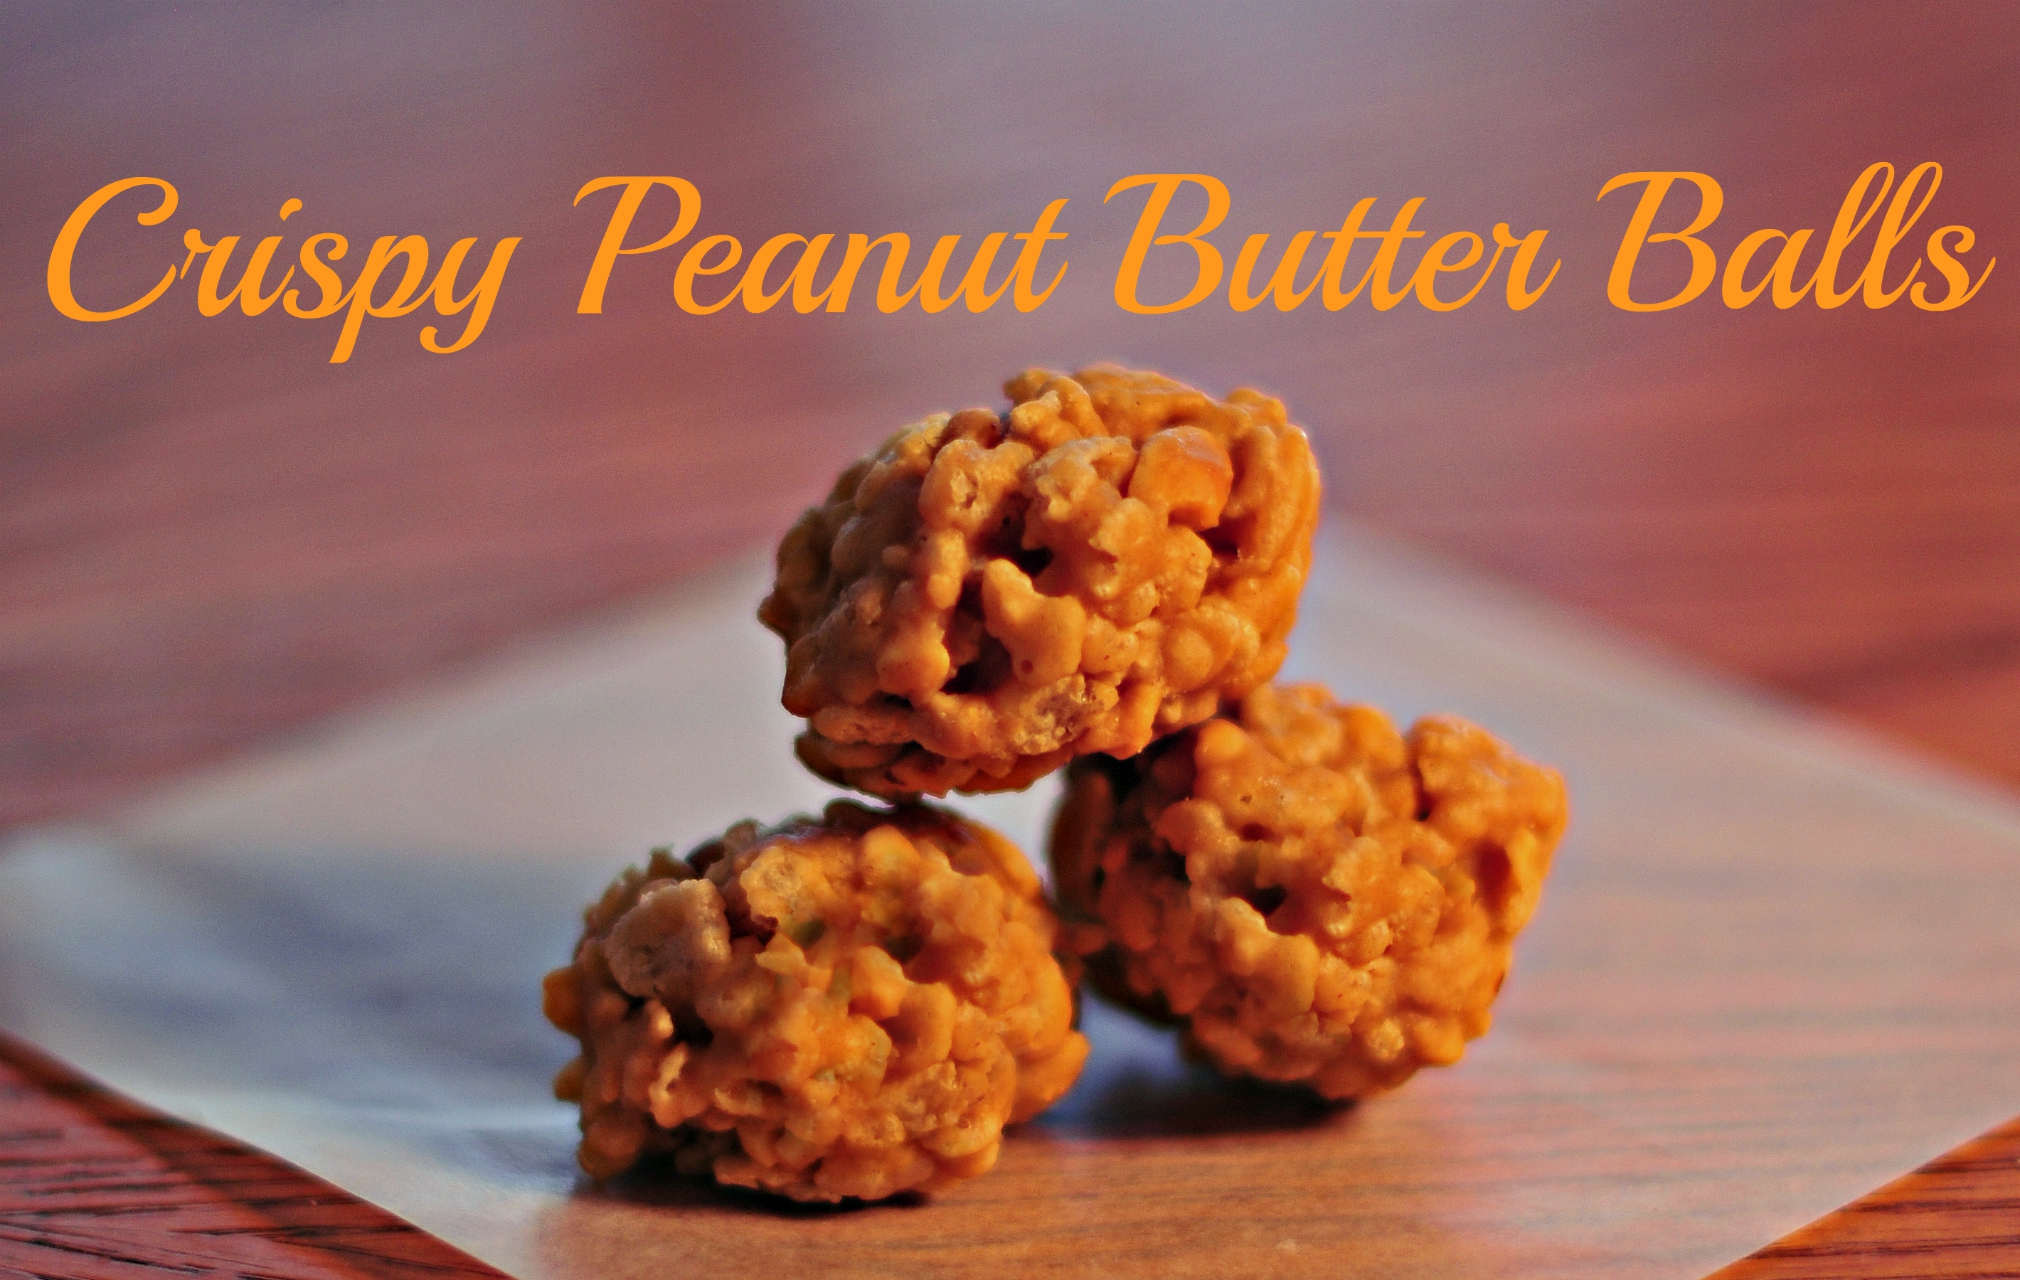 Crispy Peanut Butter Balls Recipe - The Neighborhood Moms